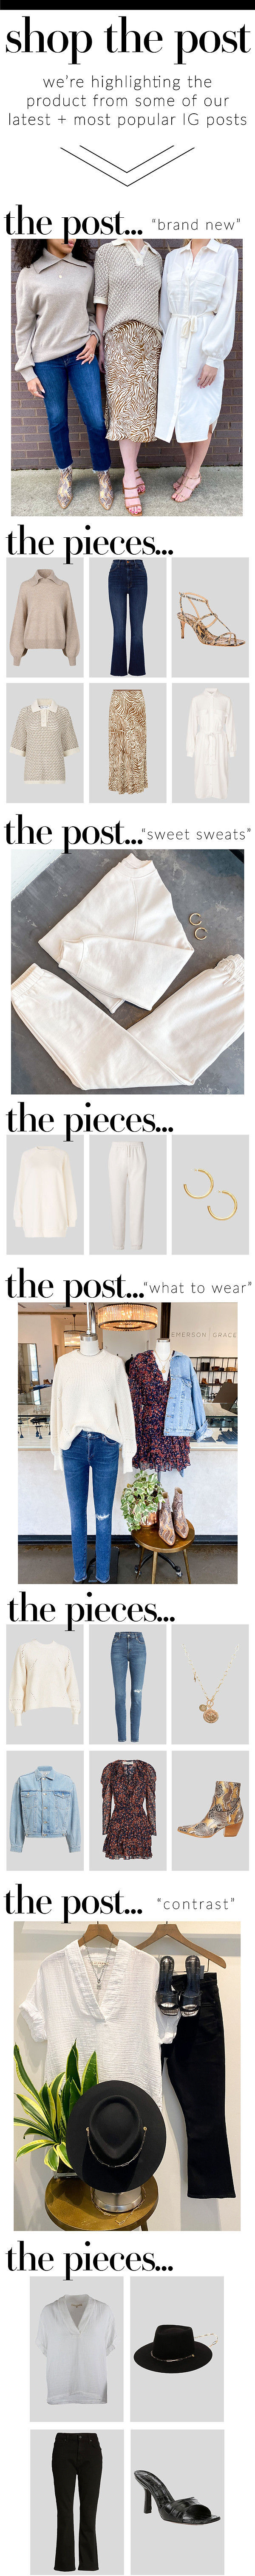 shop the post-03.jpg